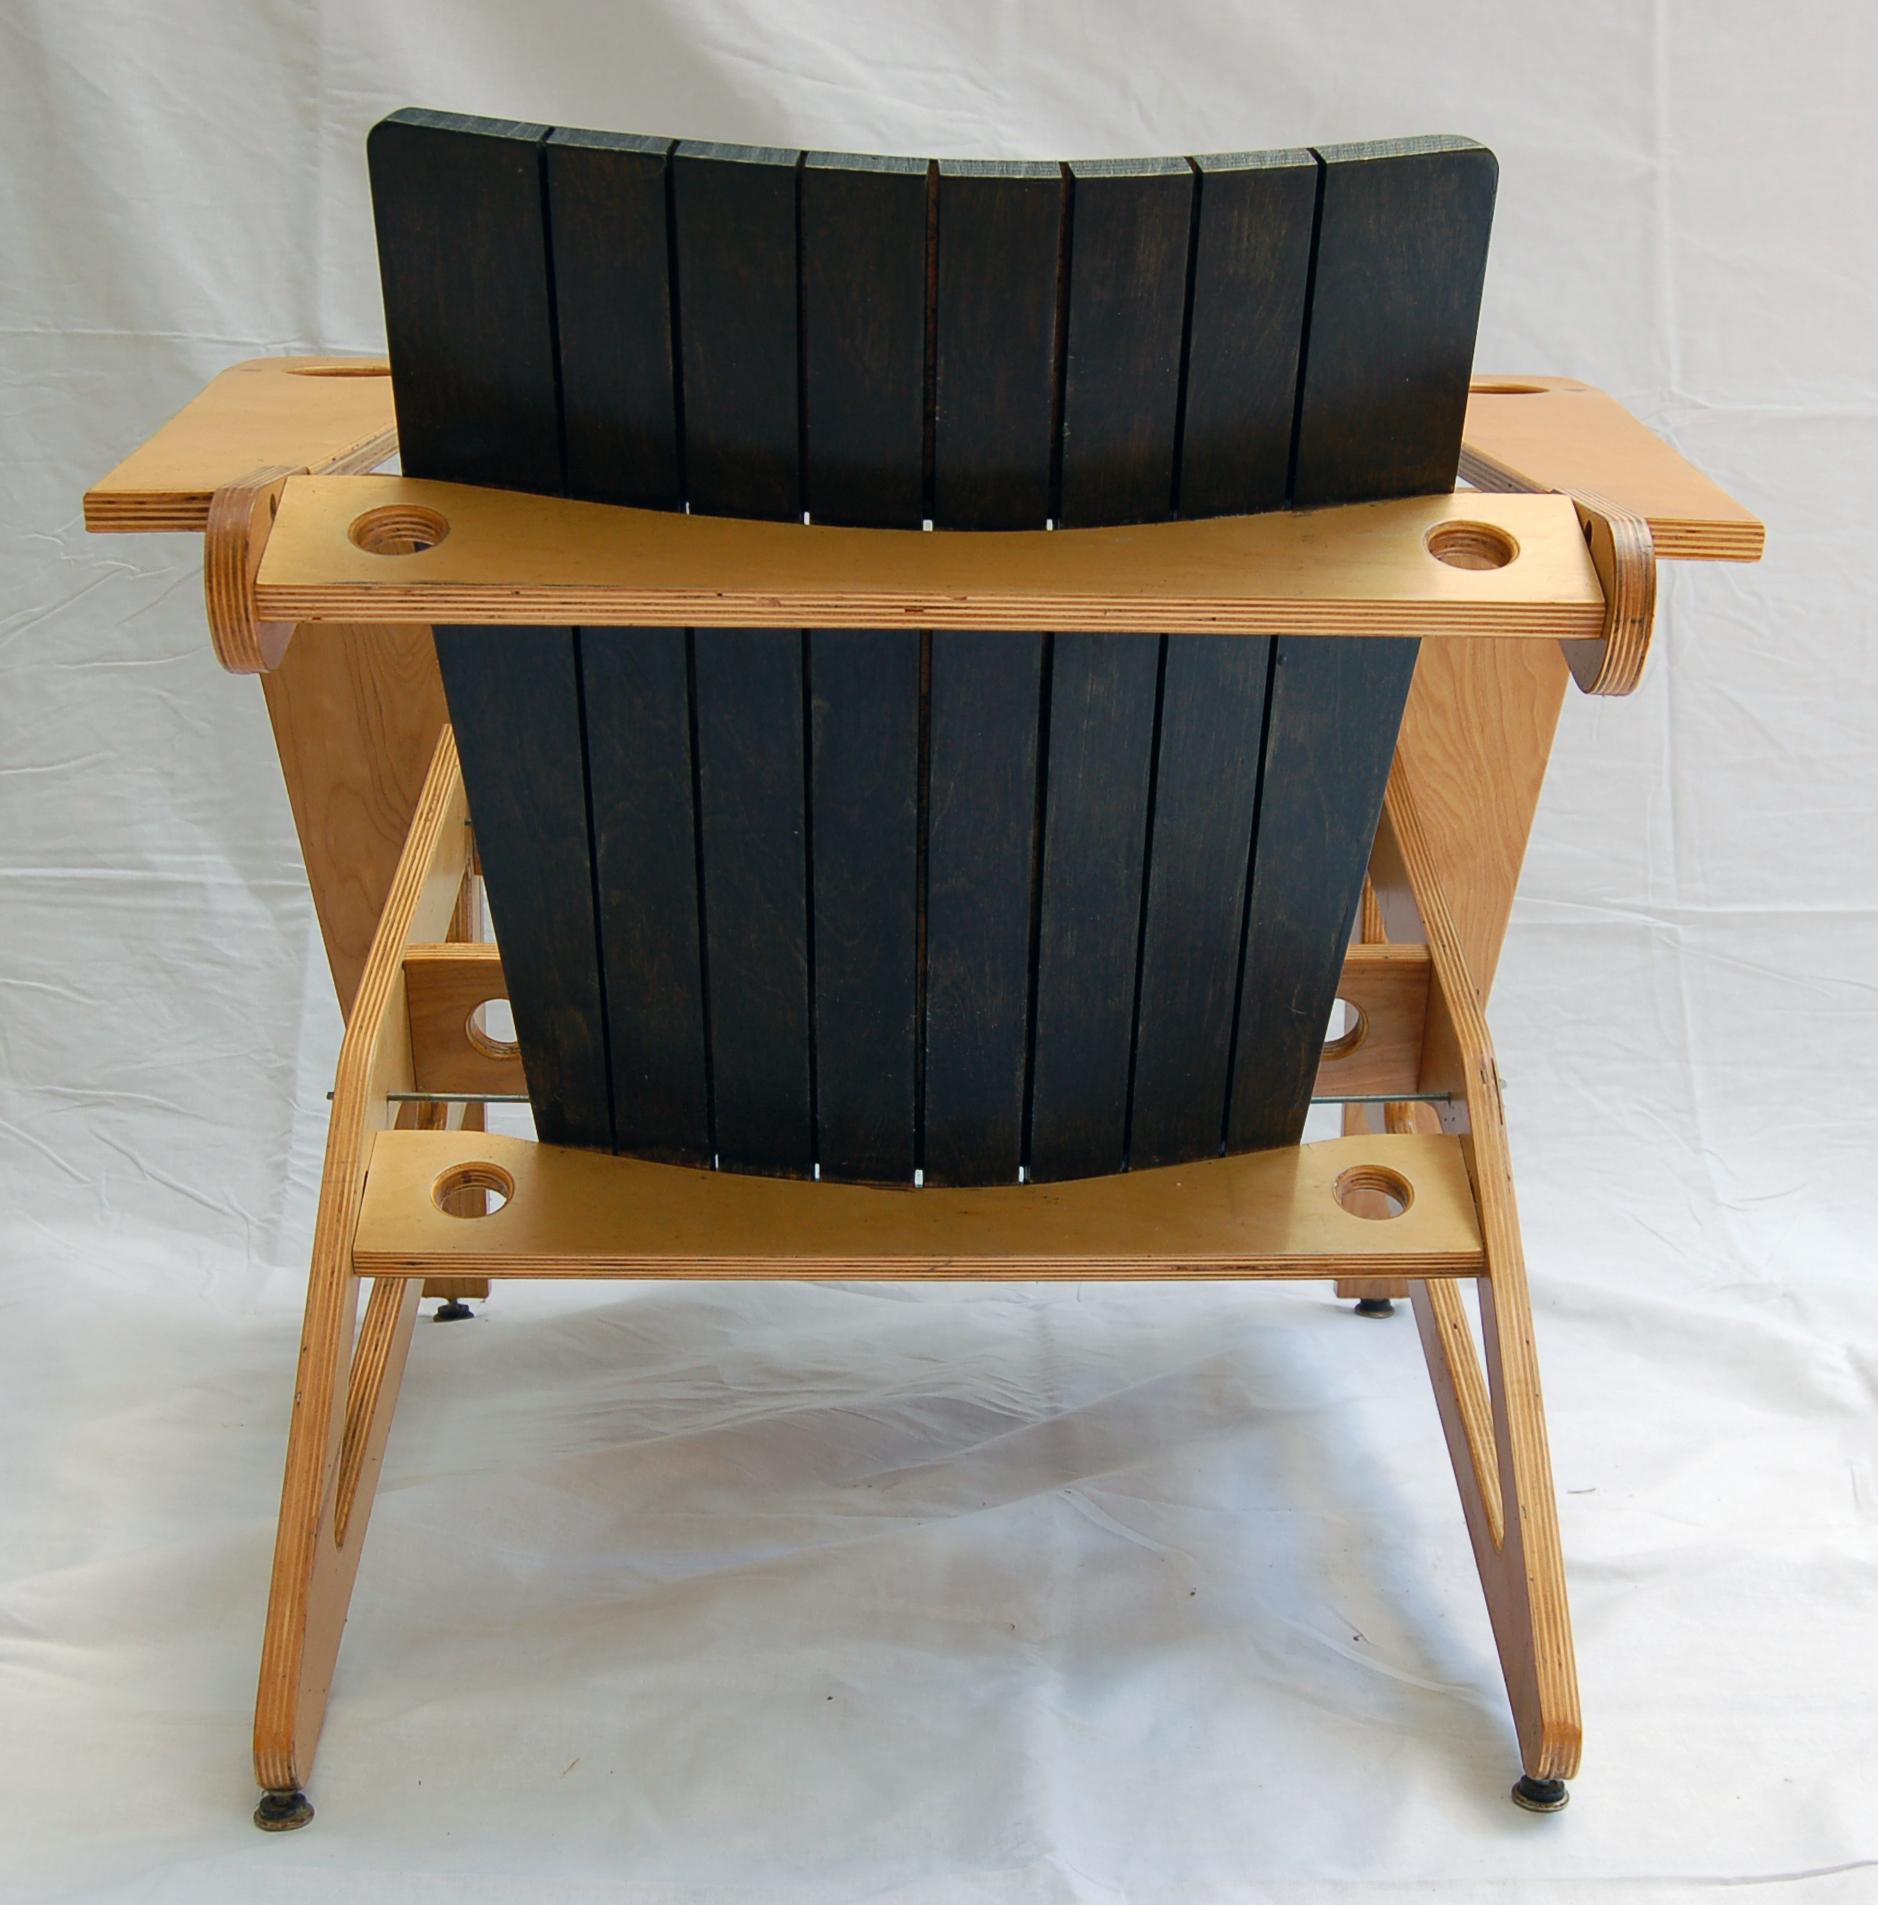 plywood chair back angle